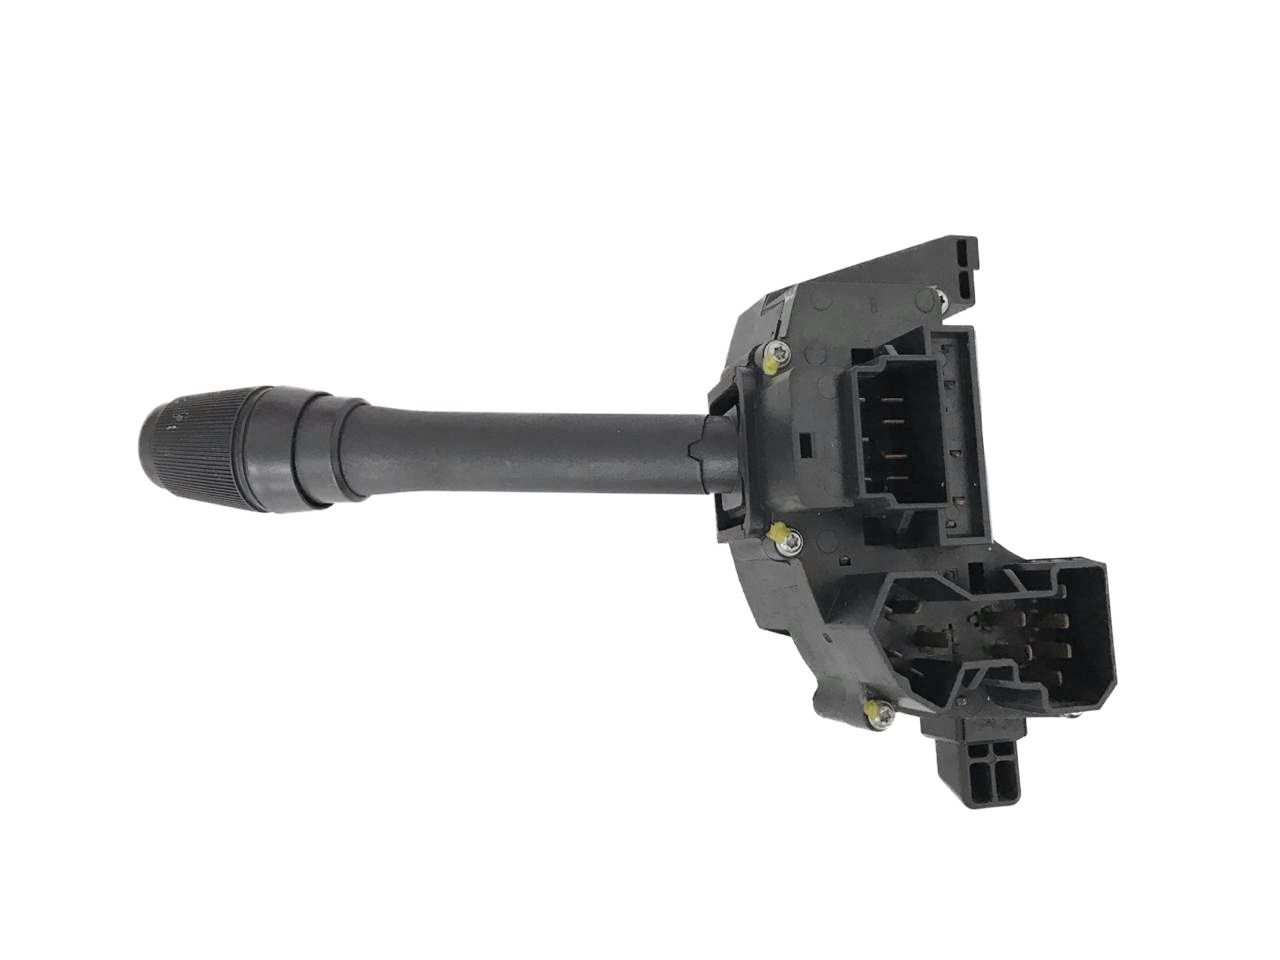 Alavanca Braço Haste Interruptor Chave De Seta Limpador Lanterna Farol Pisca Alerta Ford Taurus 97